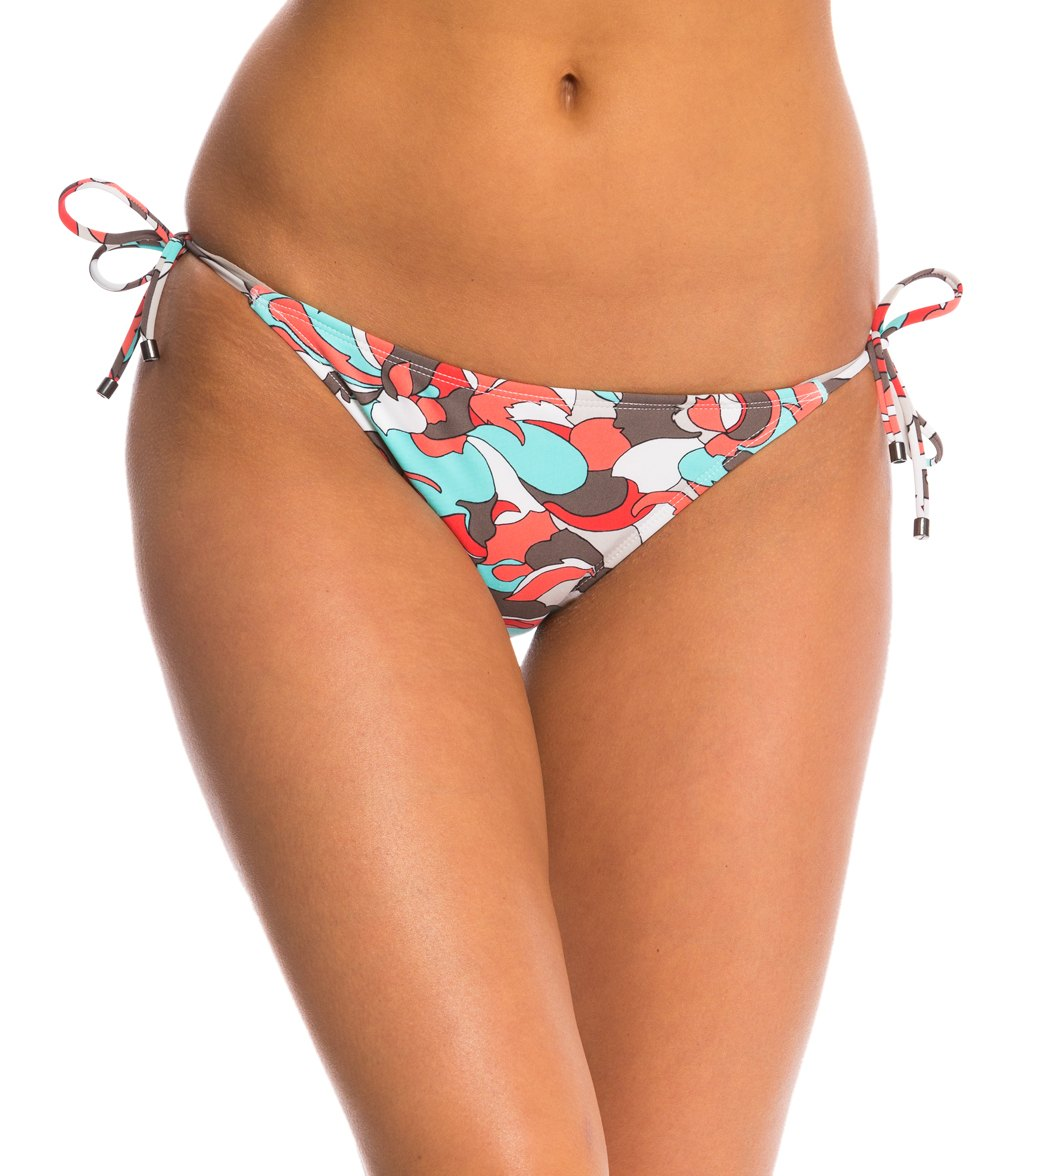 36b45c1820 Swim Systems Coconut Grove Tie-Side Bikini Bottom at SwimOutlet.com - Free  Shipping